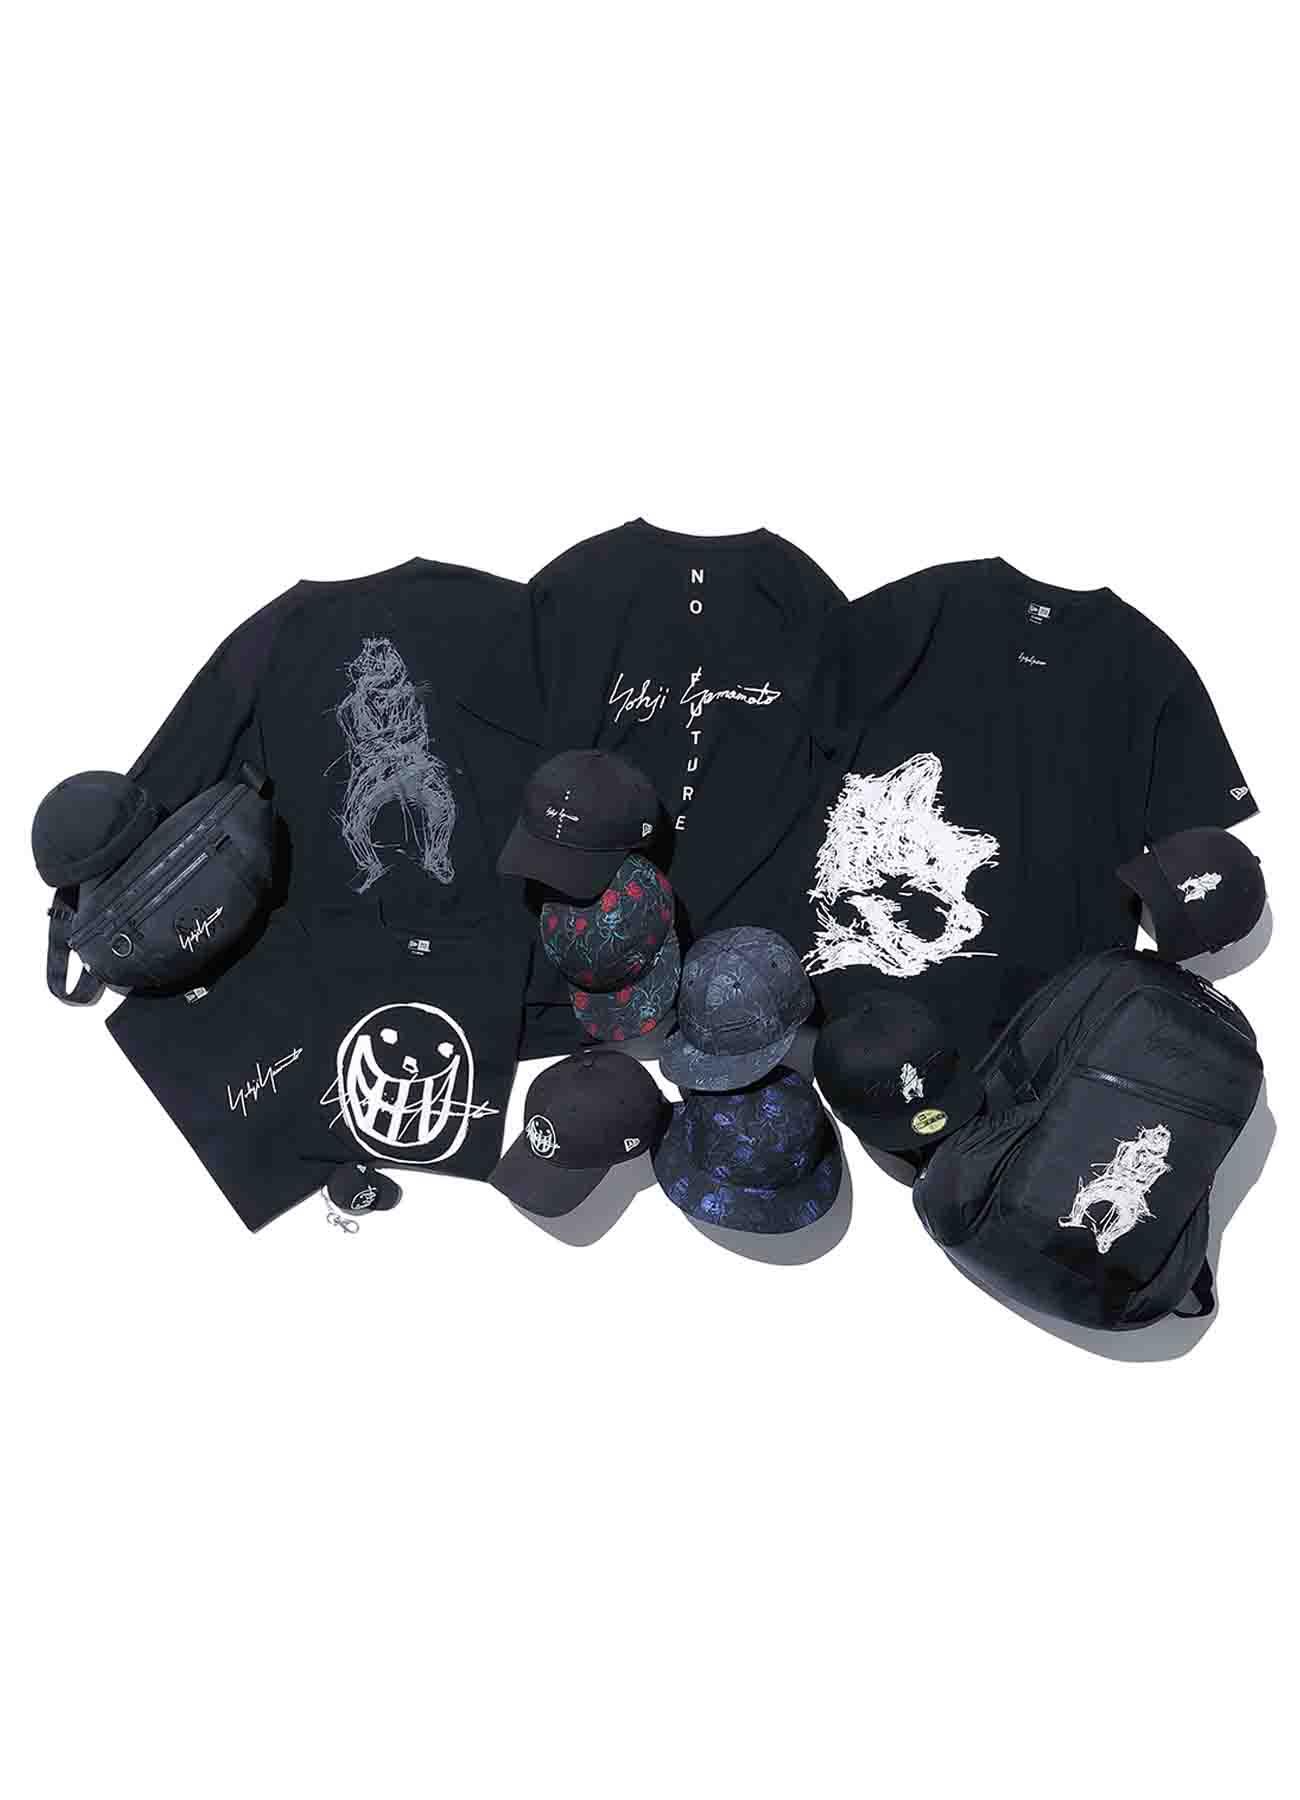 Yohji Yamamoto × New Era WOOL BLACK CAP KEYHOLDER SMILE LOGO